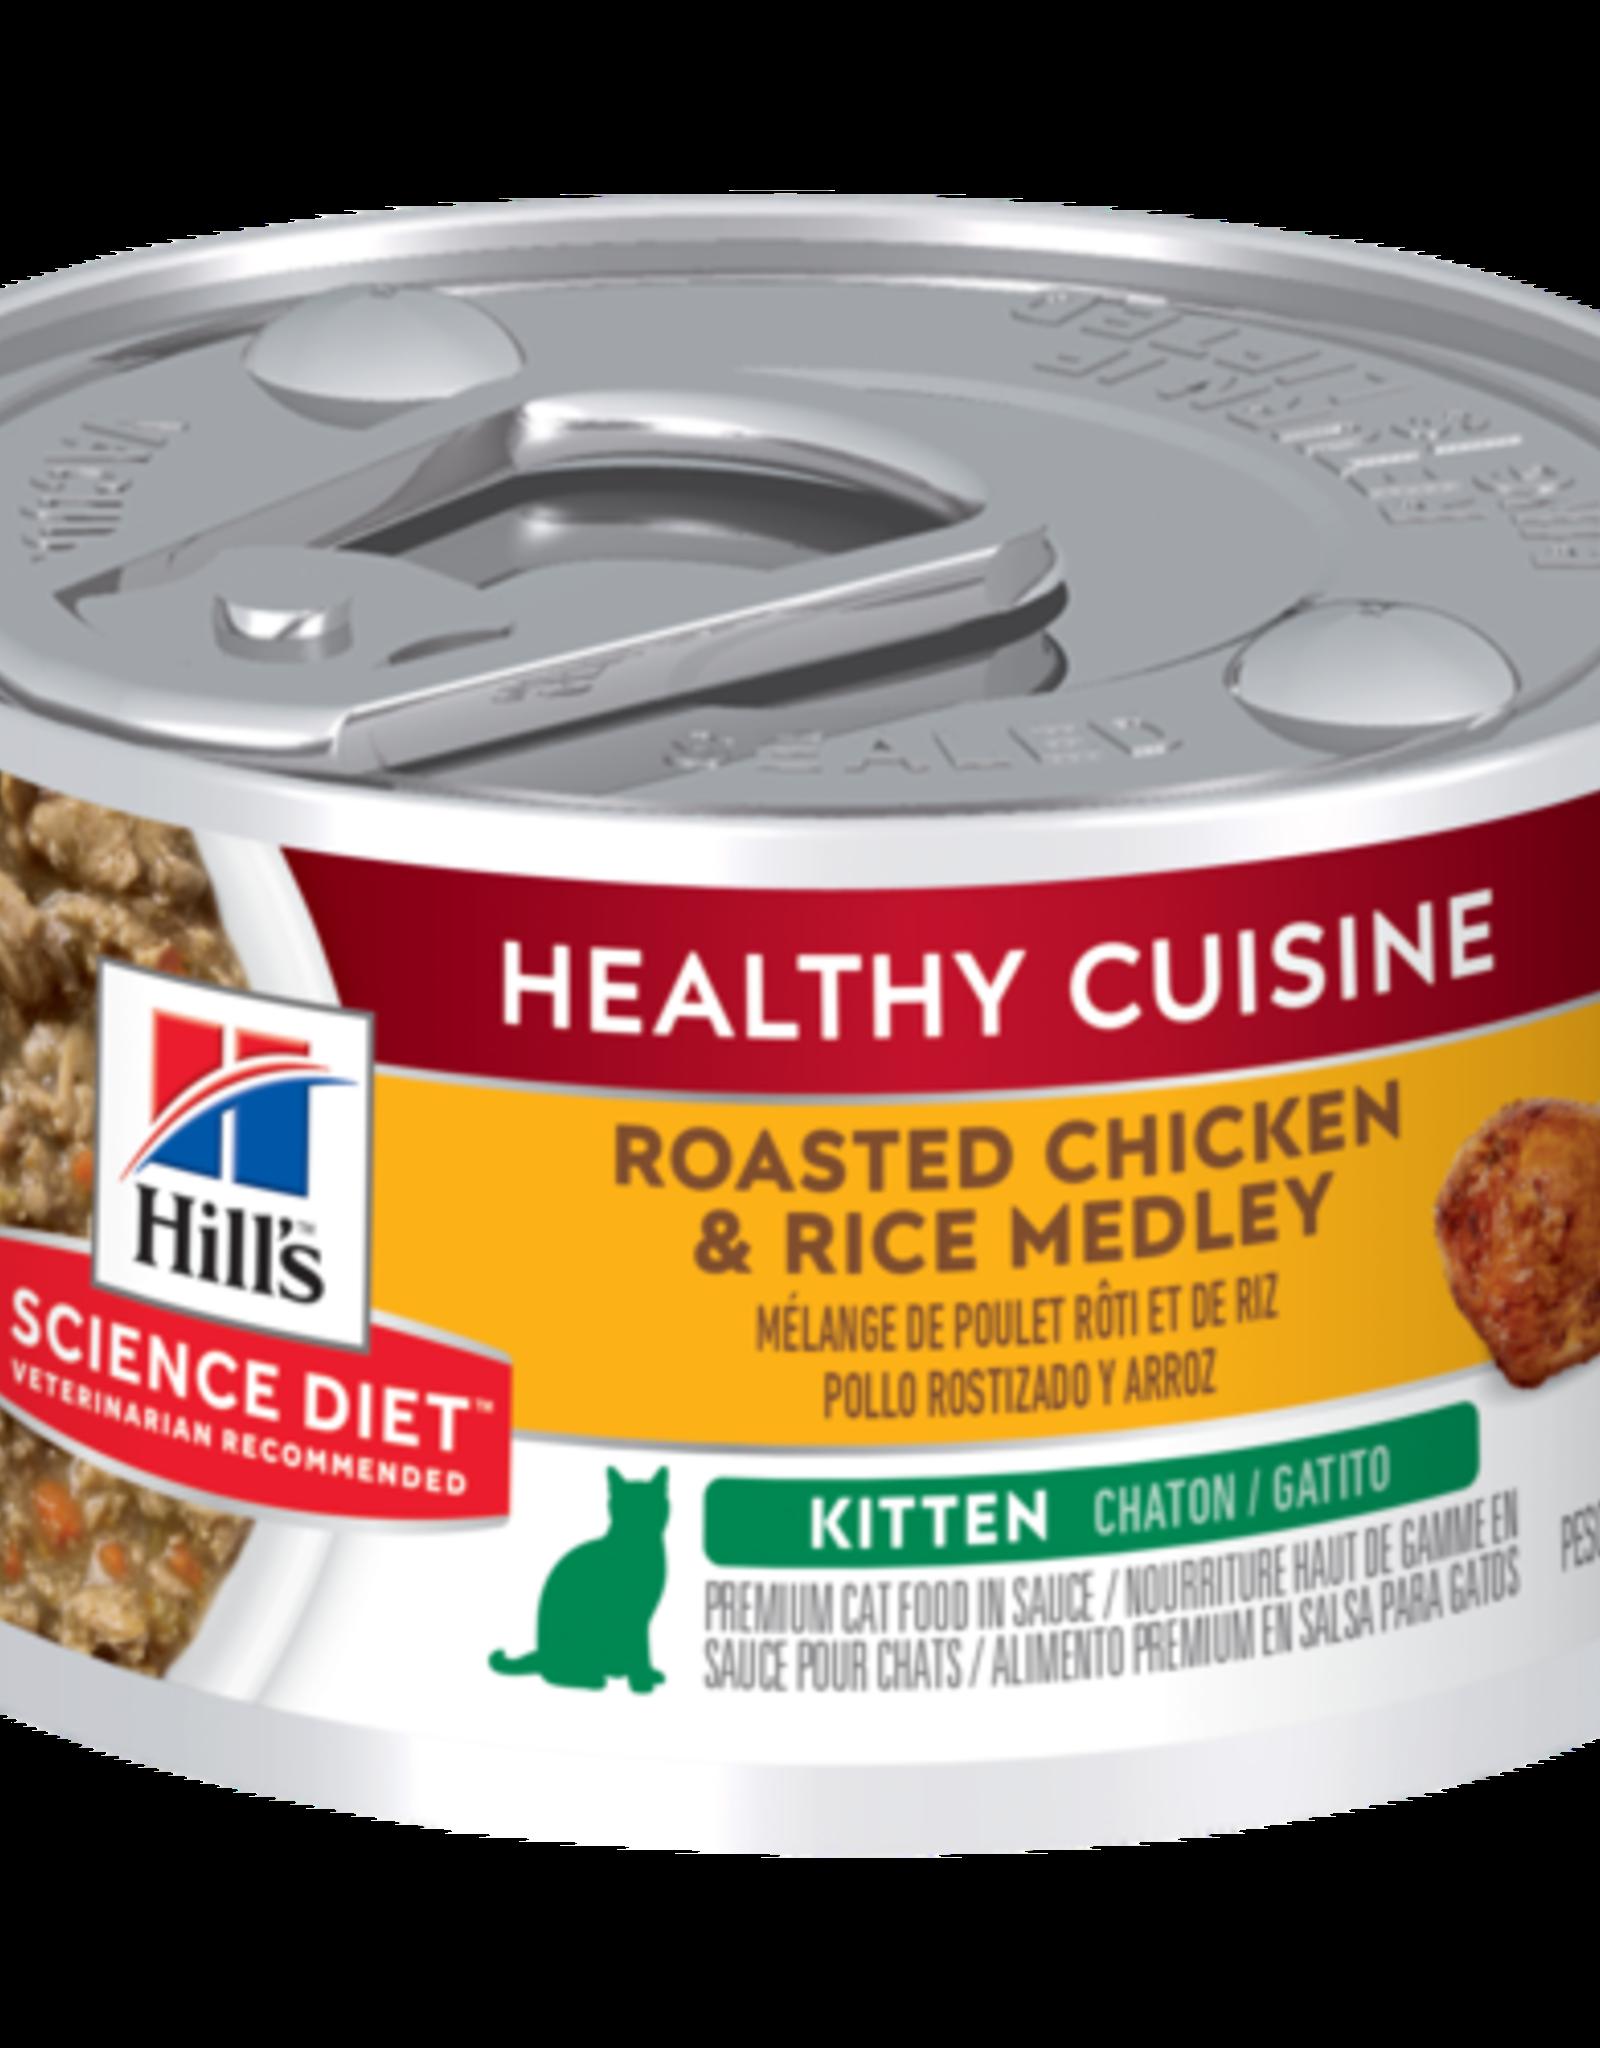 SCIENCE DIET HILL'S SCIENCE DIET FELINE HEALTHY CUISINE KITTEN CHICKEN & RICE 2.8OZ CASE OF 24